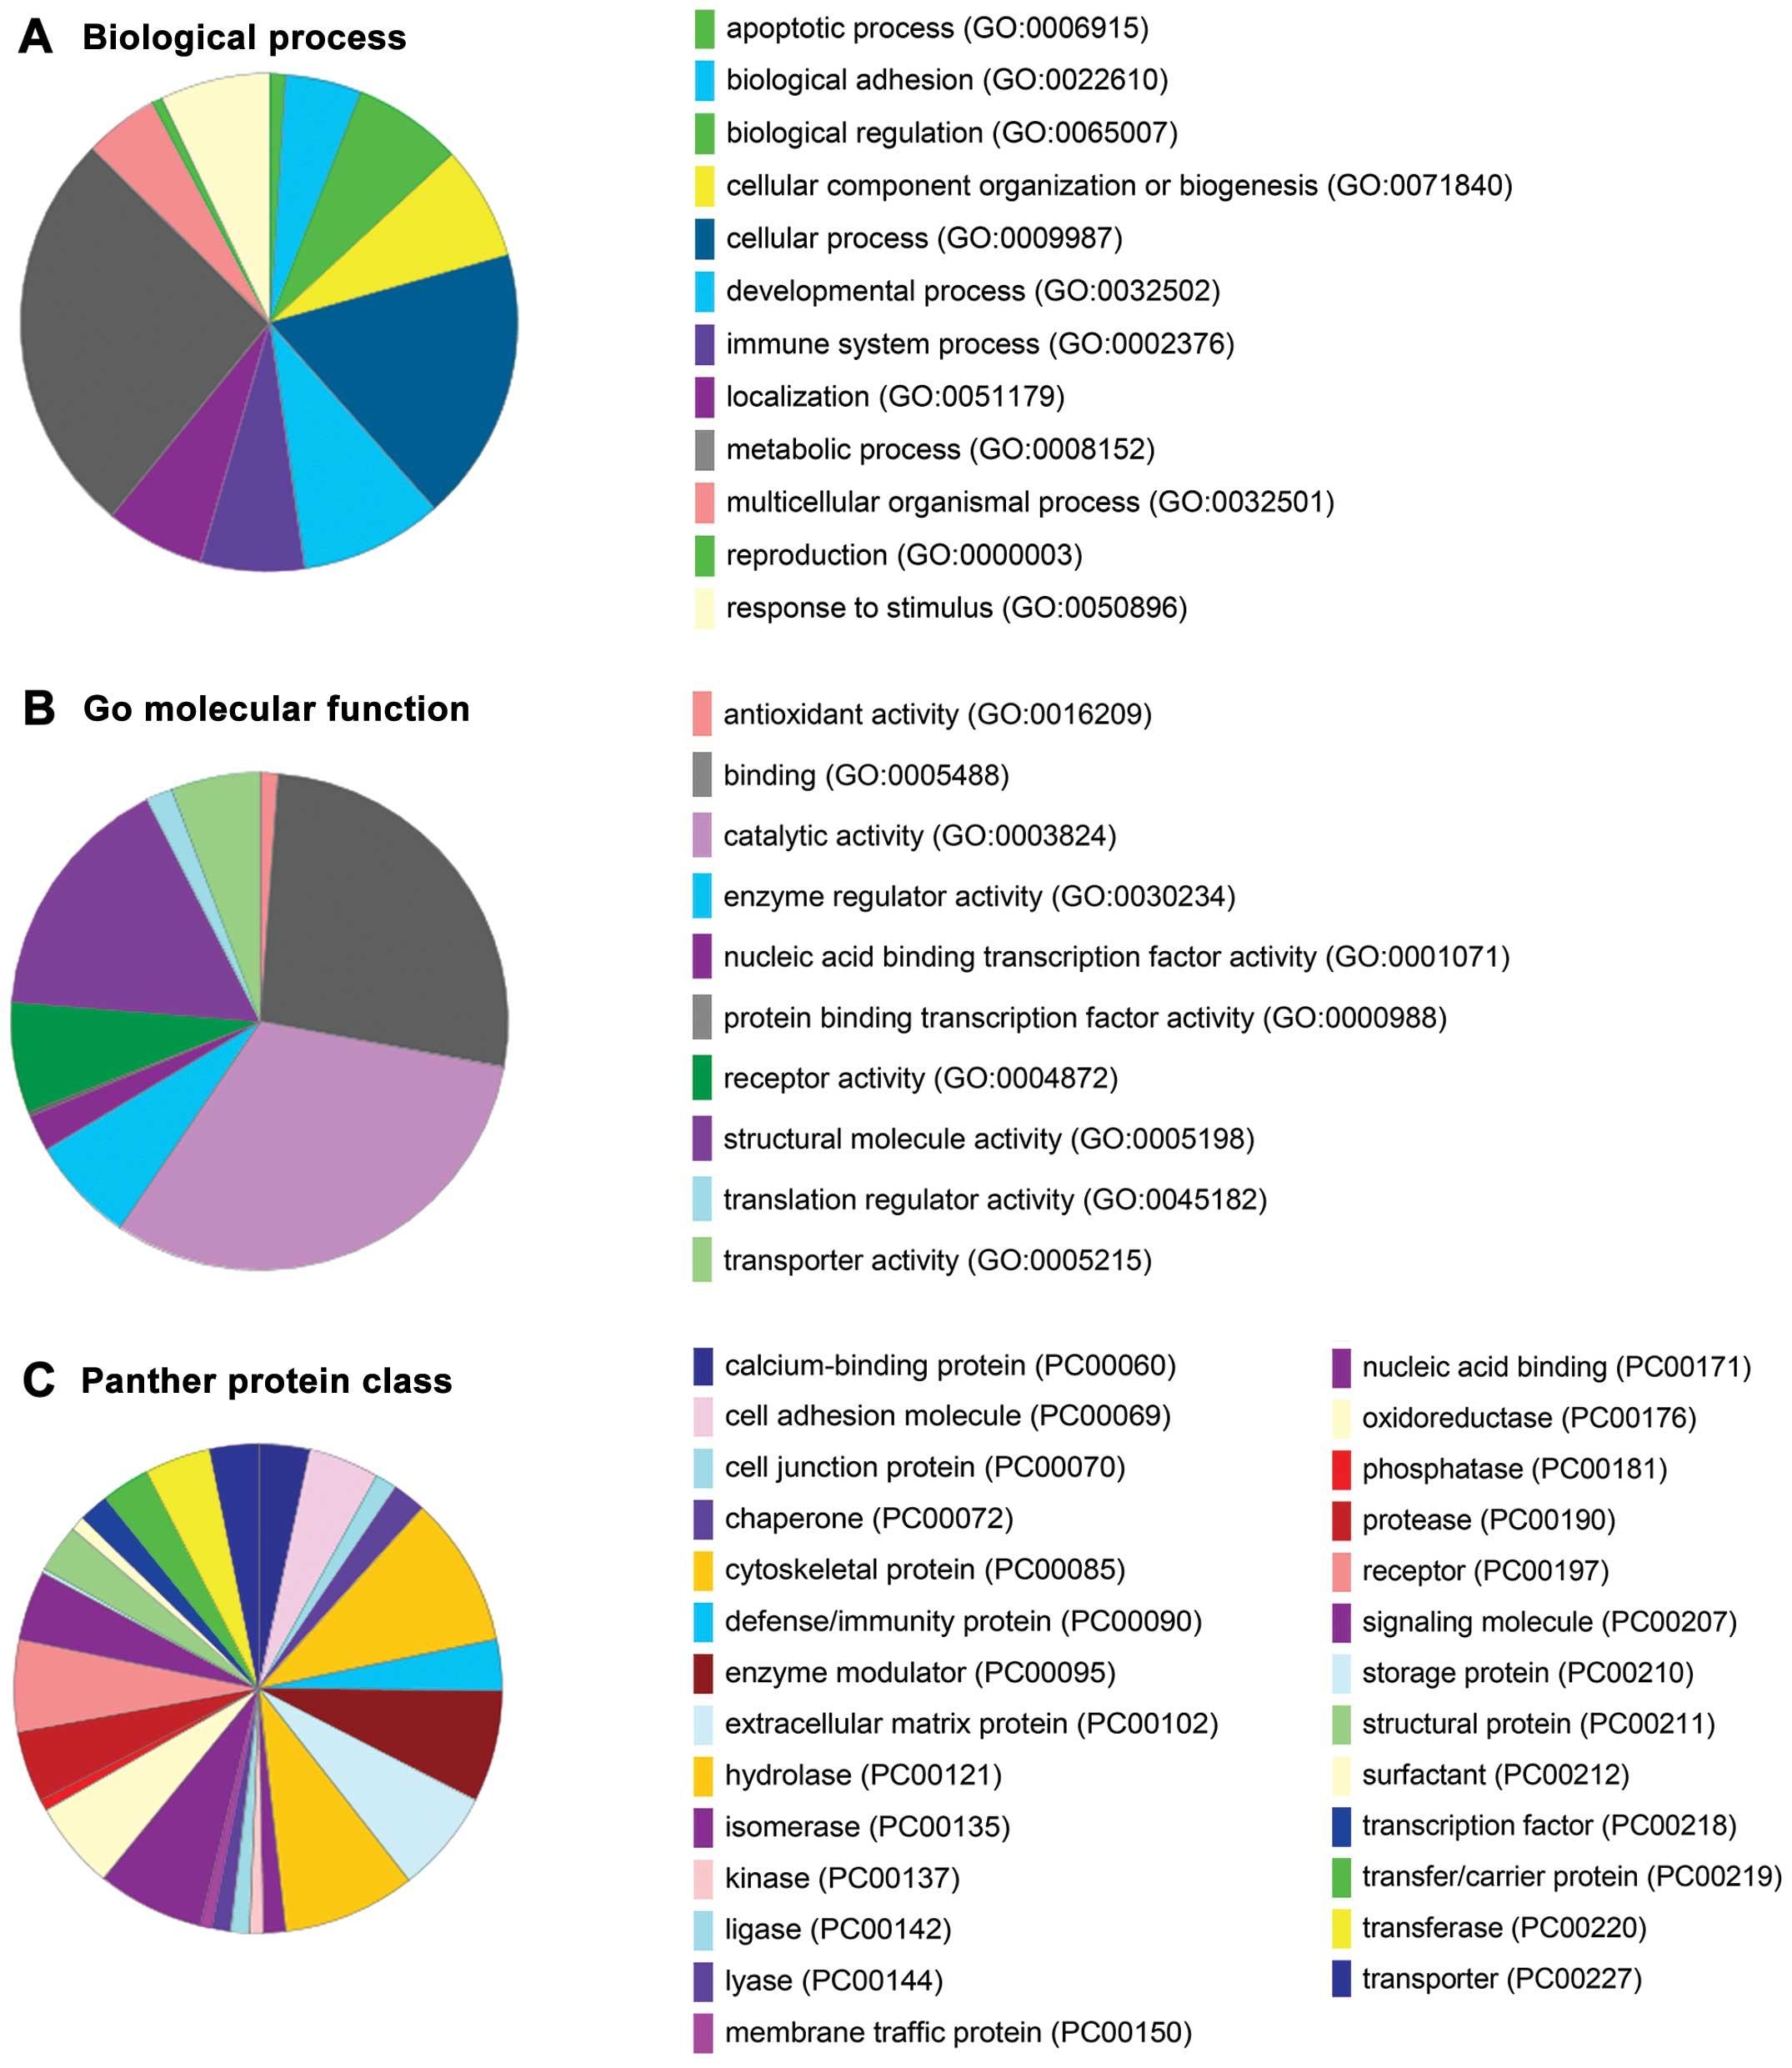 ITRAQ-based Quantitative Proteomic Analysis Of Cervical Cancer